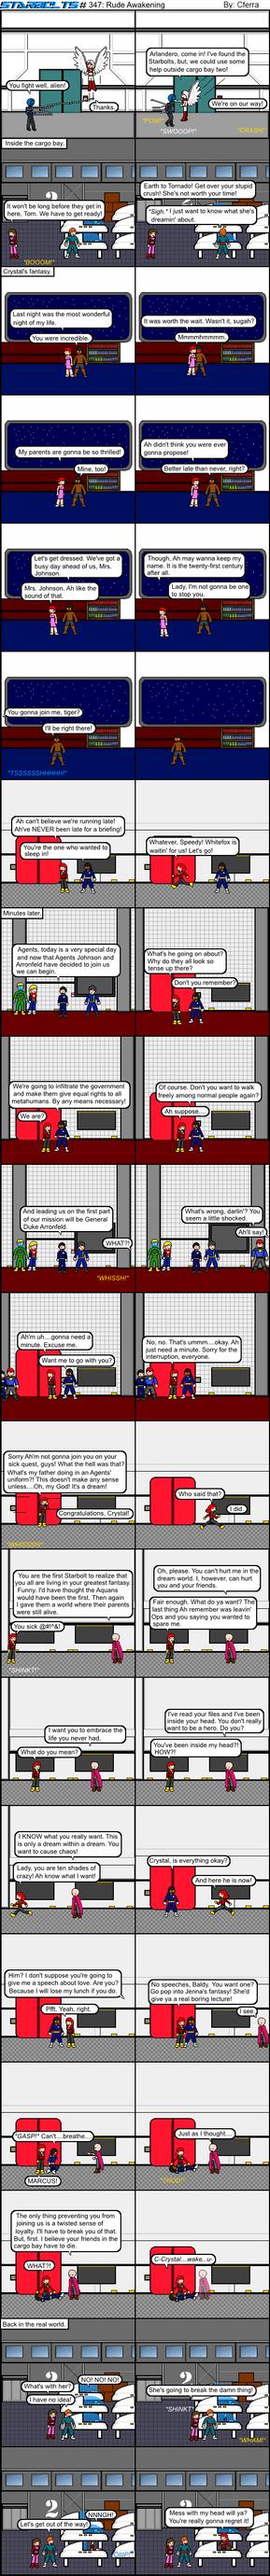 Starbolts #347: Rude Awakening by Cferra1